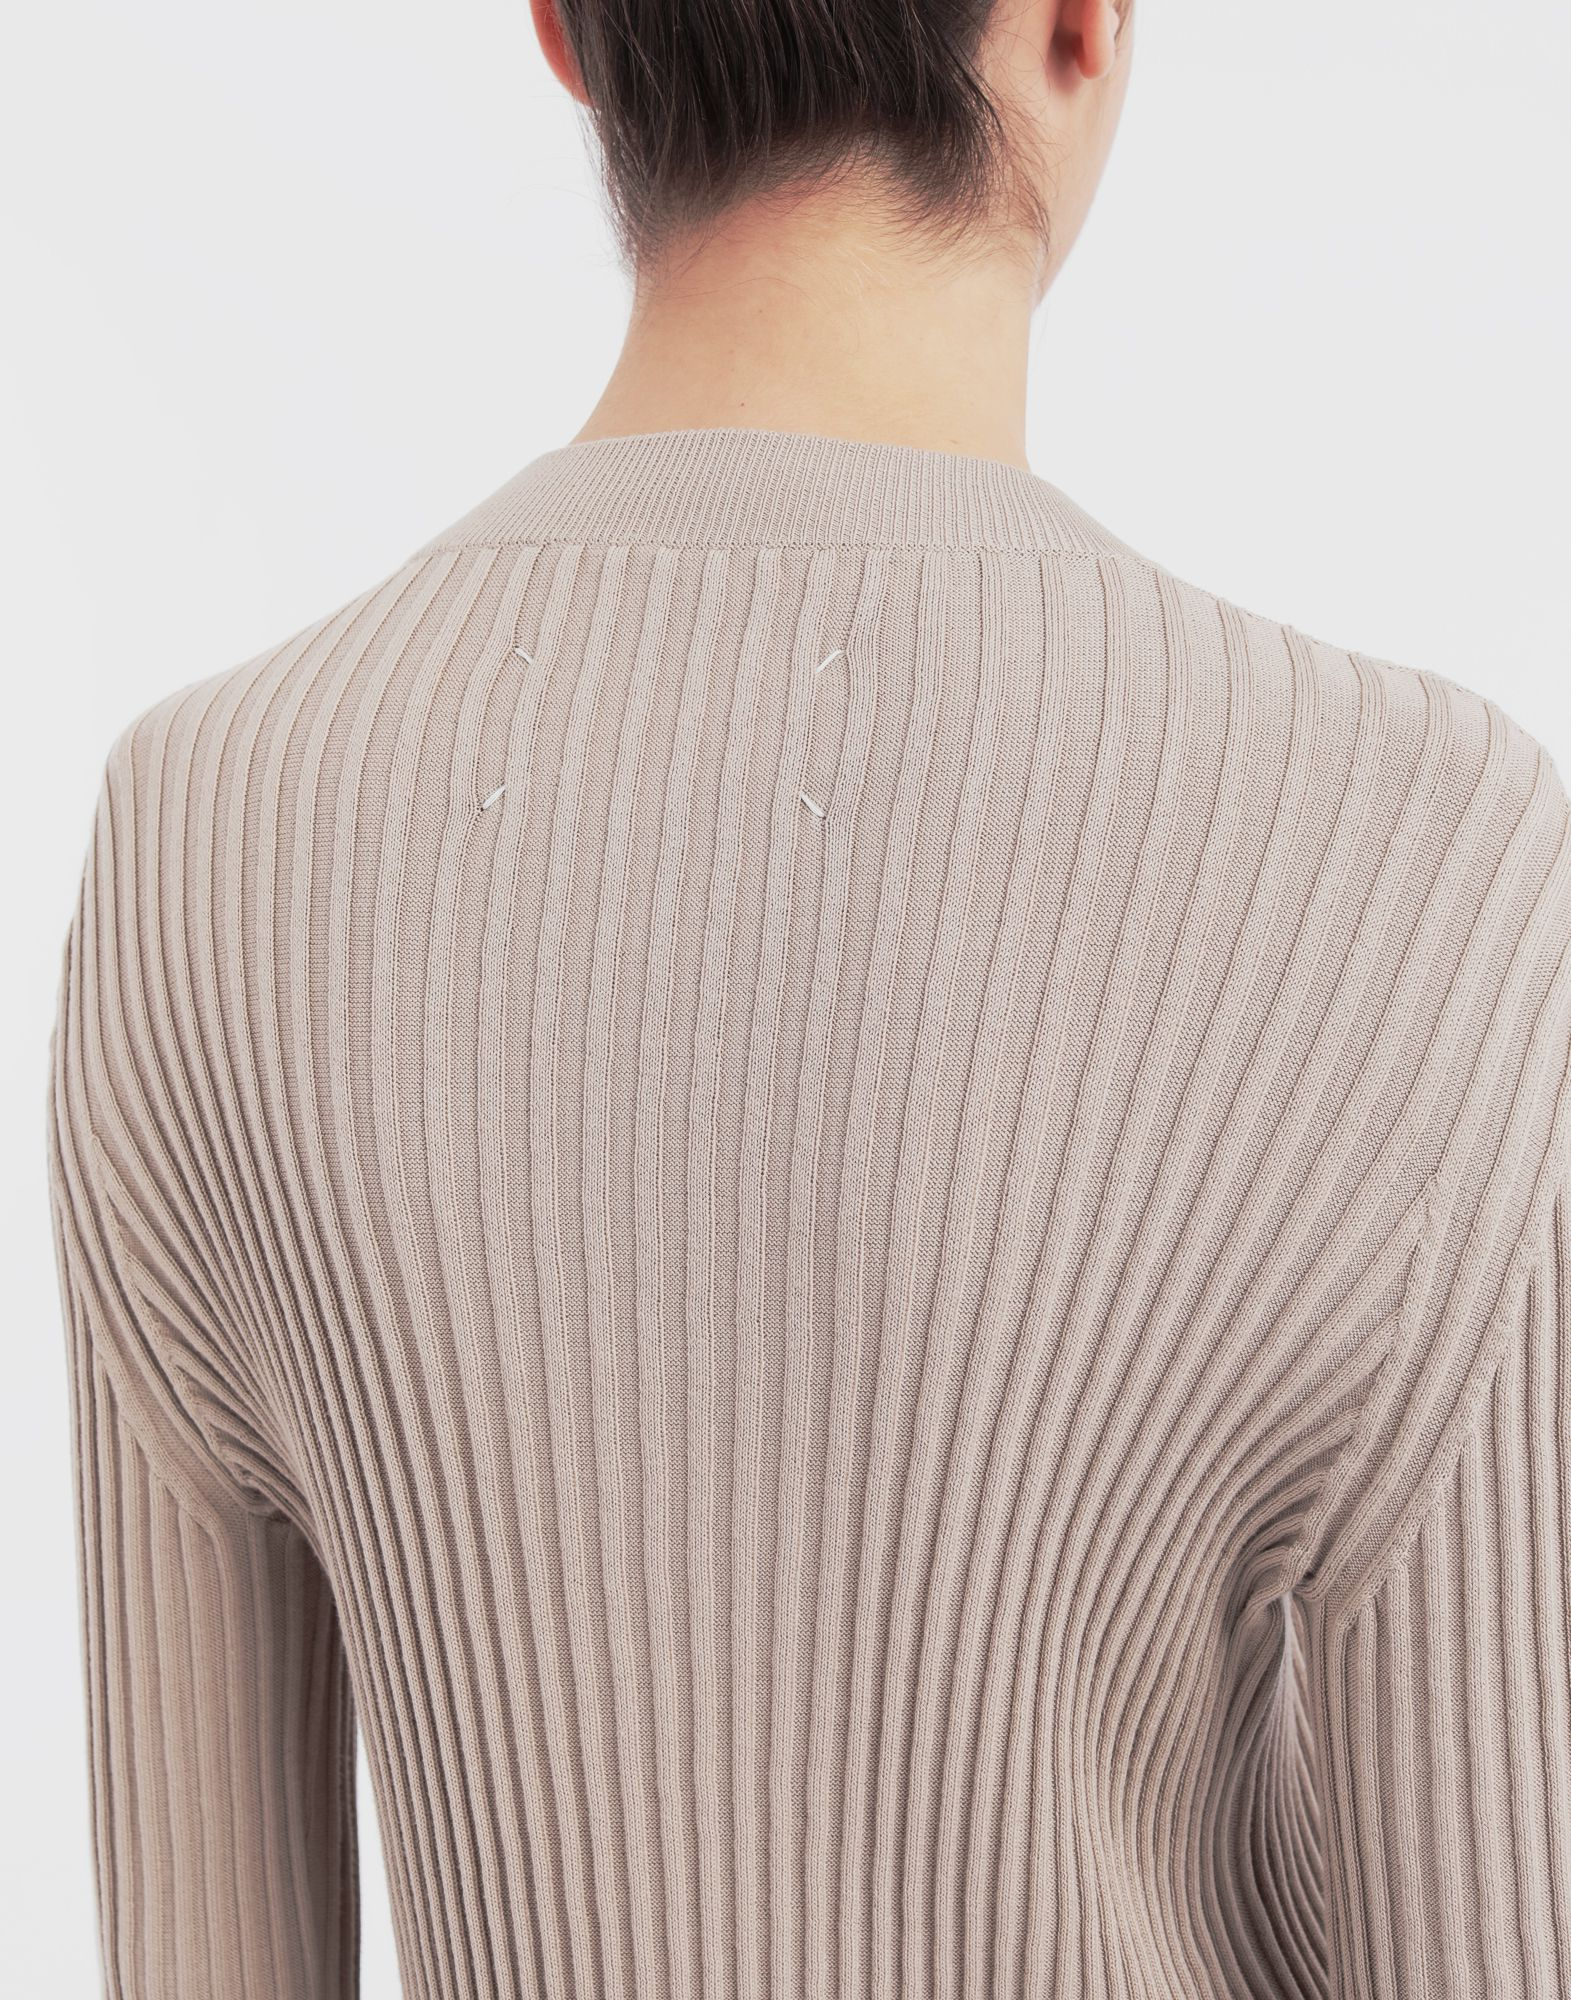 MAISON MARGIELA Ribs jumper in 'Carton' intarsia Long sleeve sweater Woman b